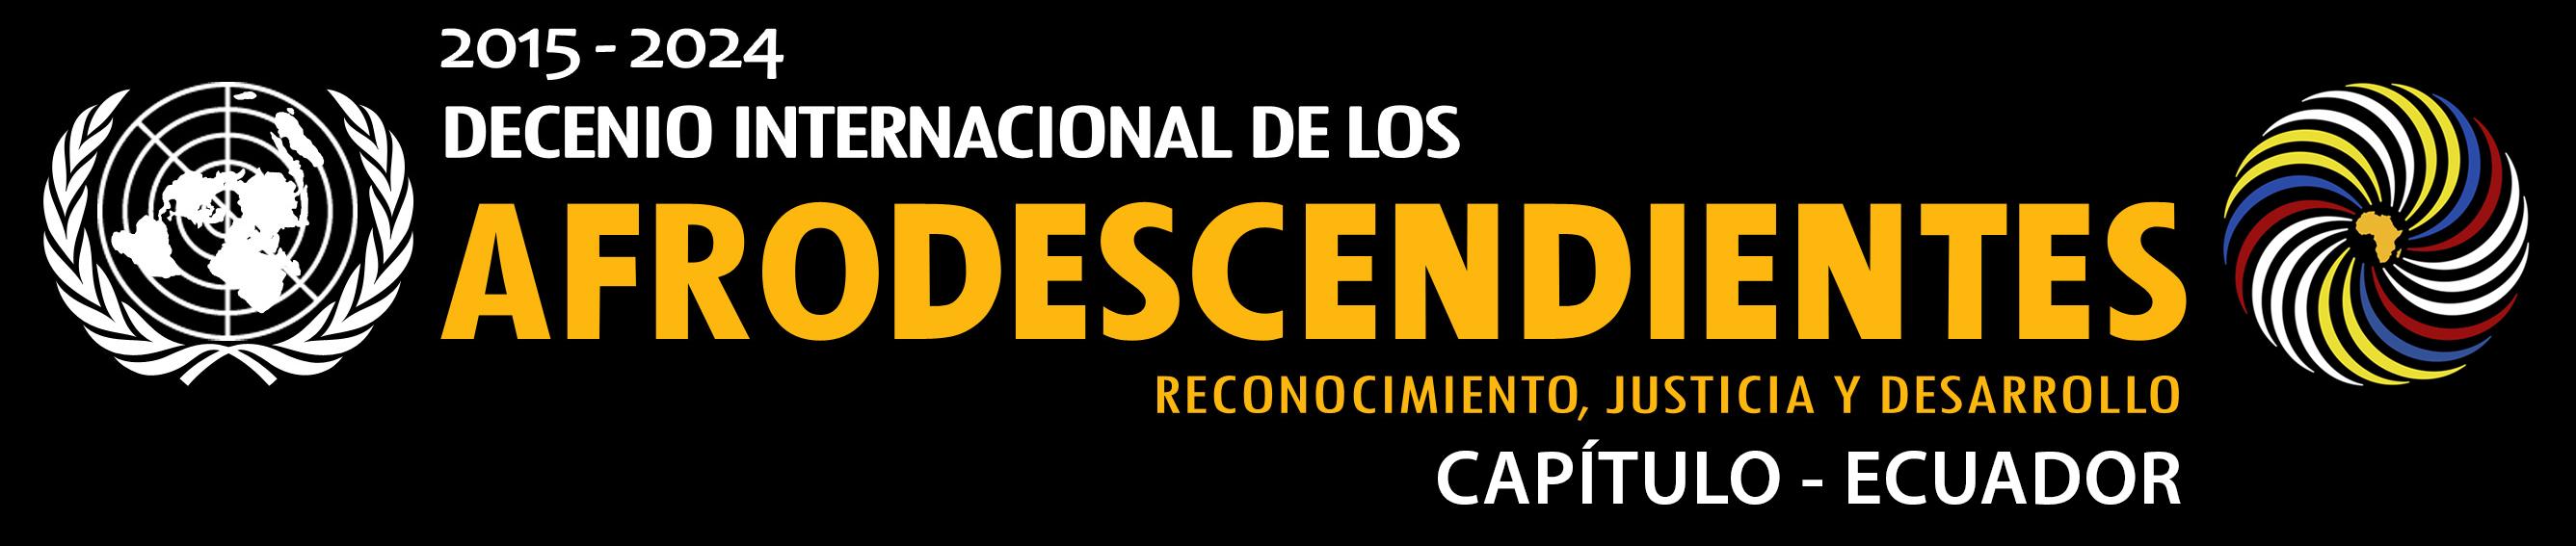 3-Decenio-ecuador